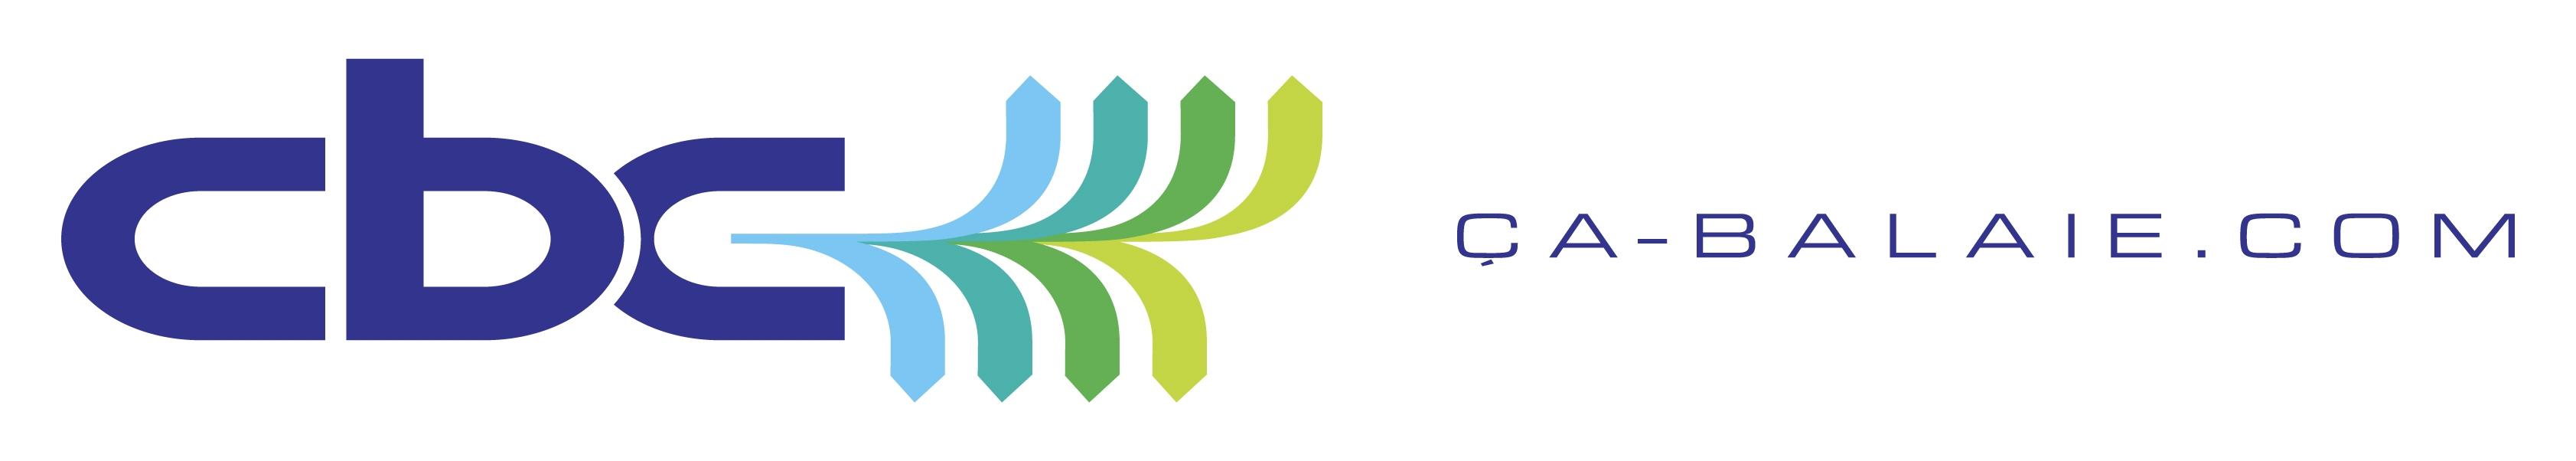 ça-Balaie.com SA